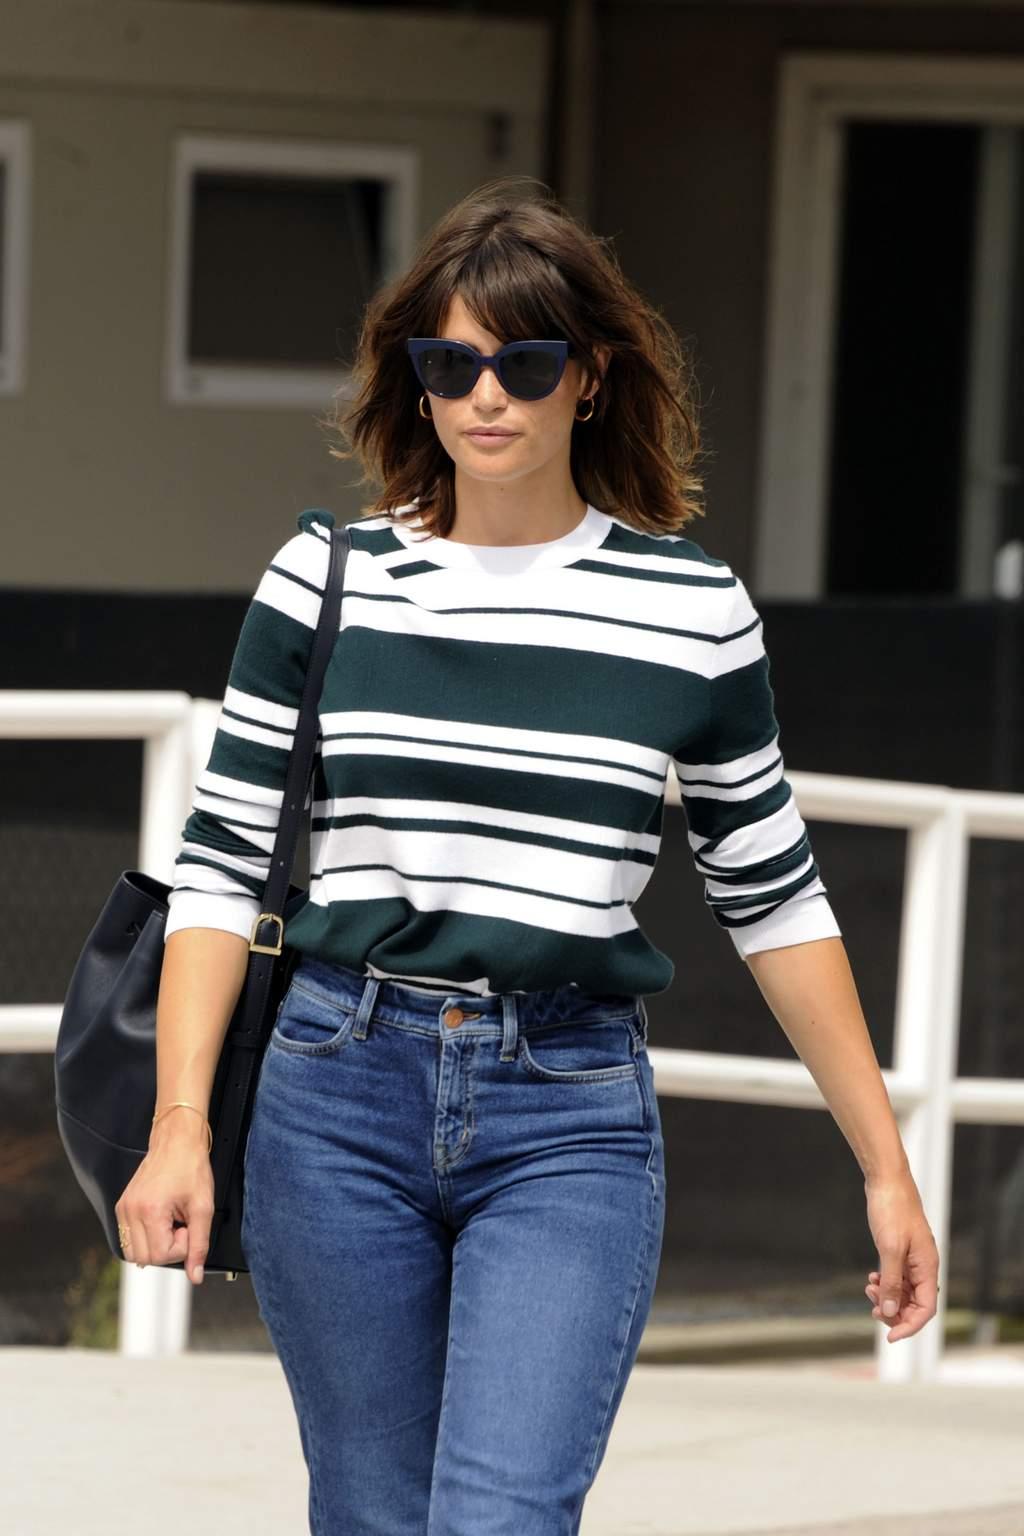 Gemma Arterton – Arriving for the Venice Film Festival HQ Photos